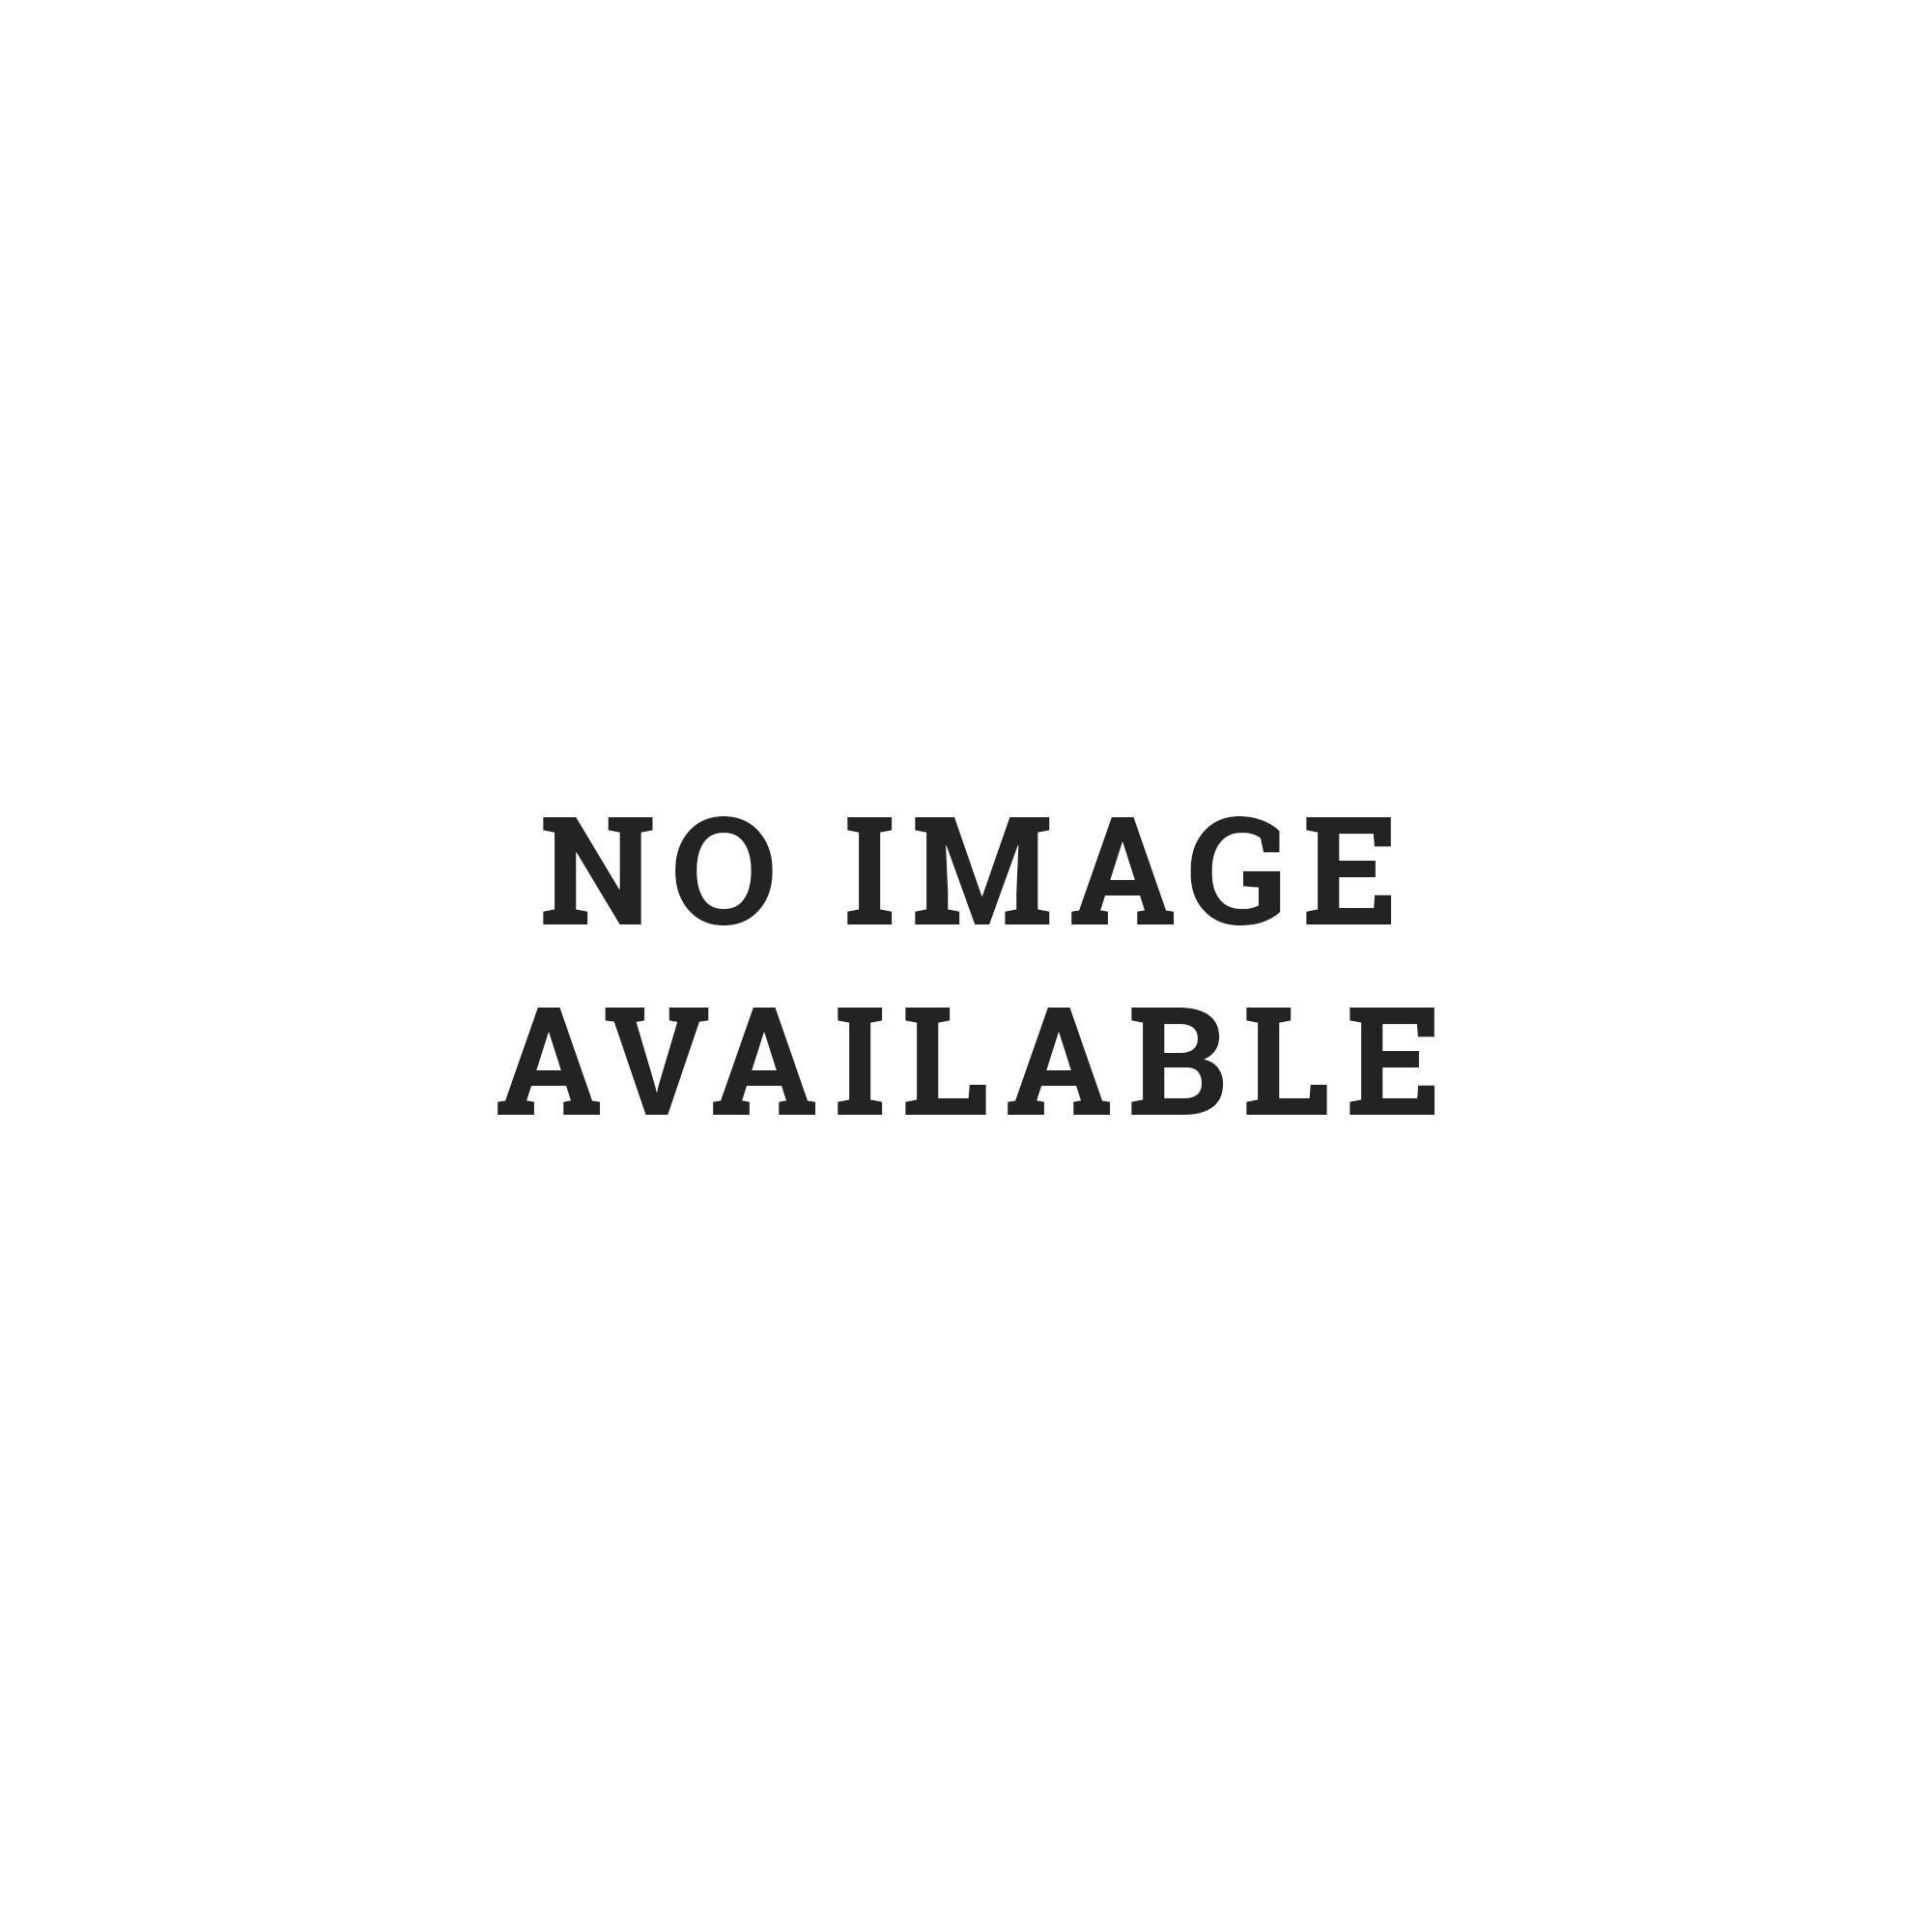 Vans VN0003CAIKT Sk8-Hi Reissue Mens Canvas Skate Shoes - Twill & Gingham